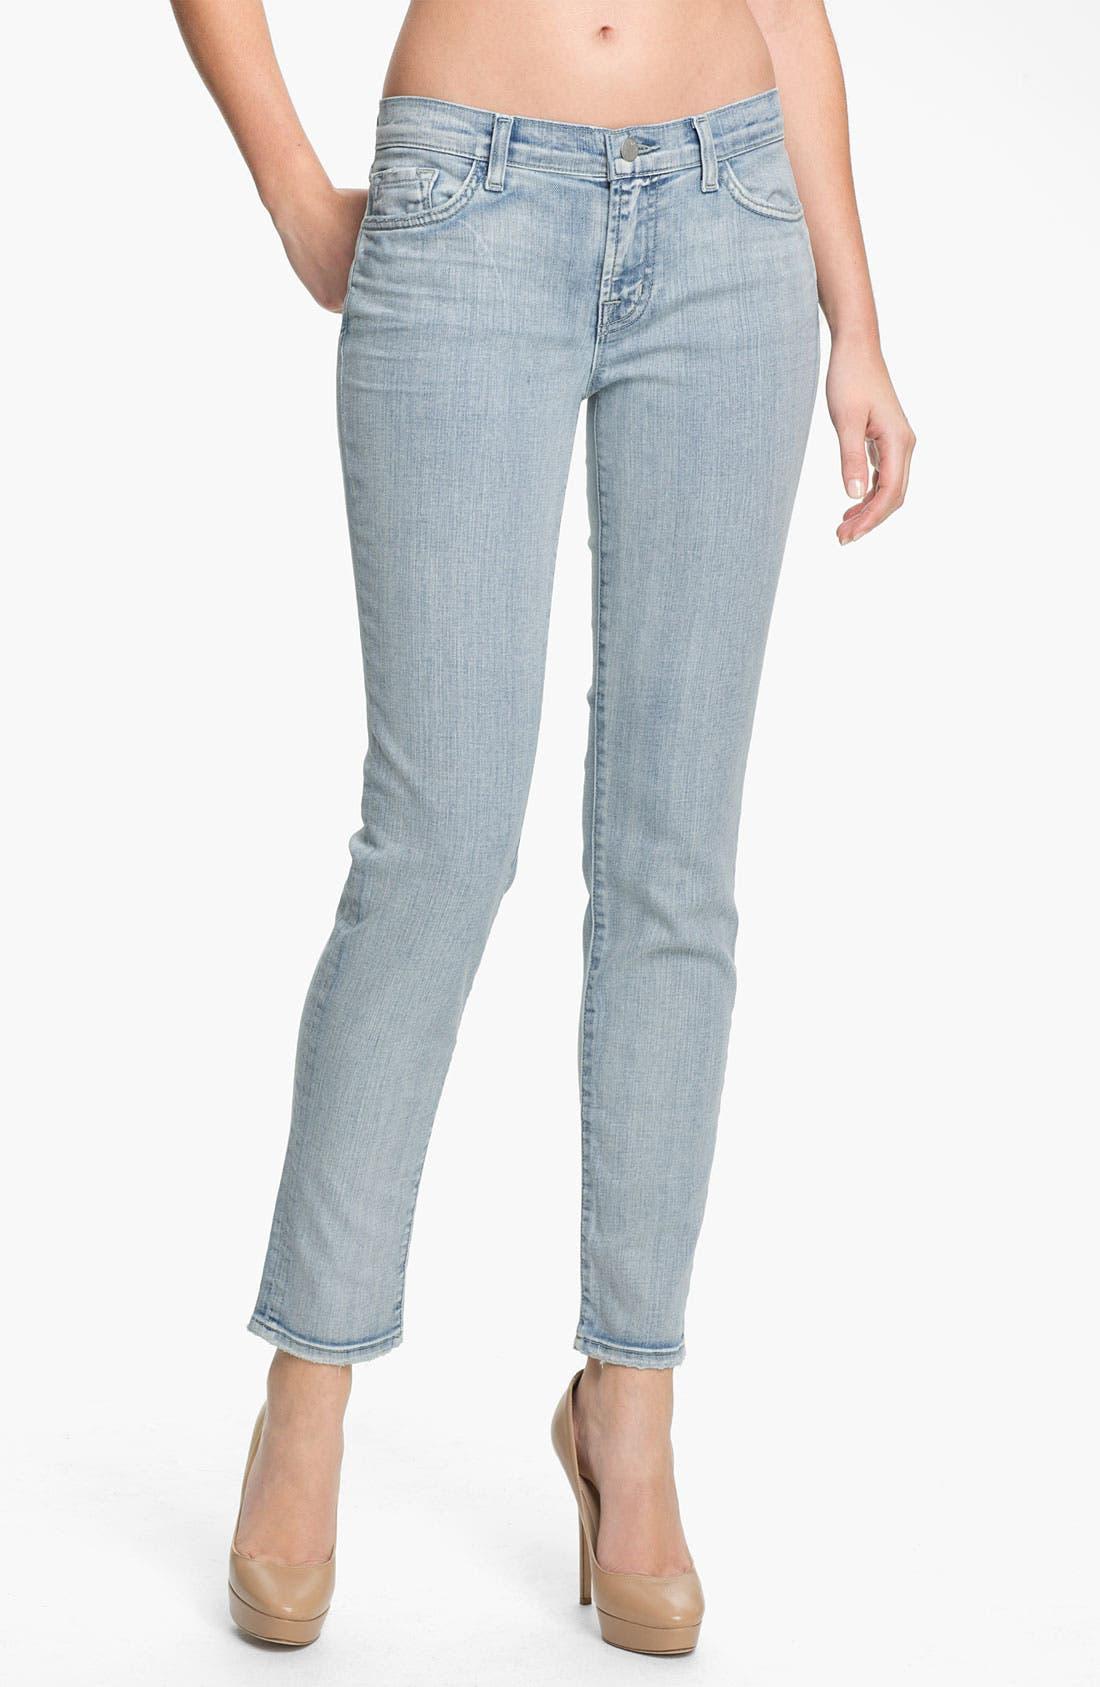 Alternate Image 1 Selected - J Brand '811' Skinny Stretch Jeans (Afterlife)